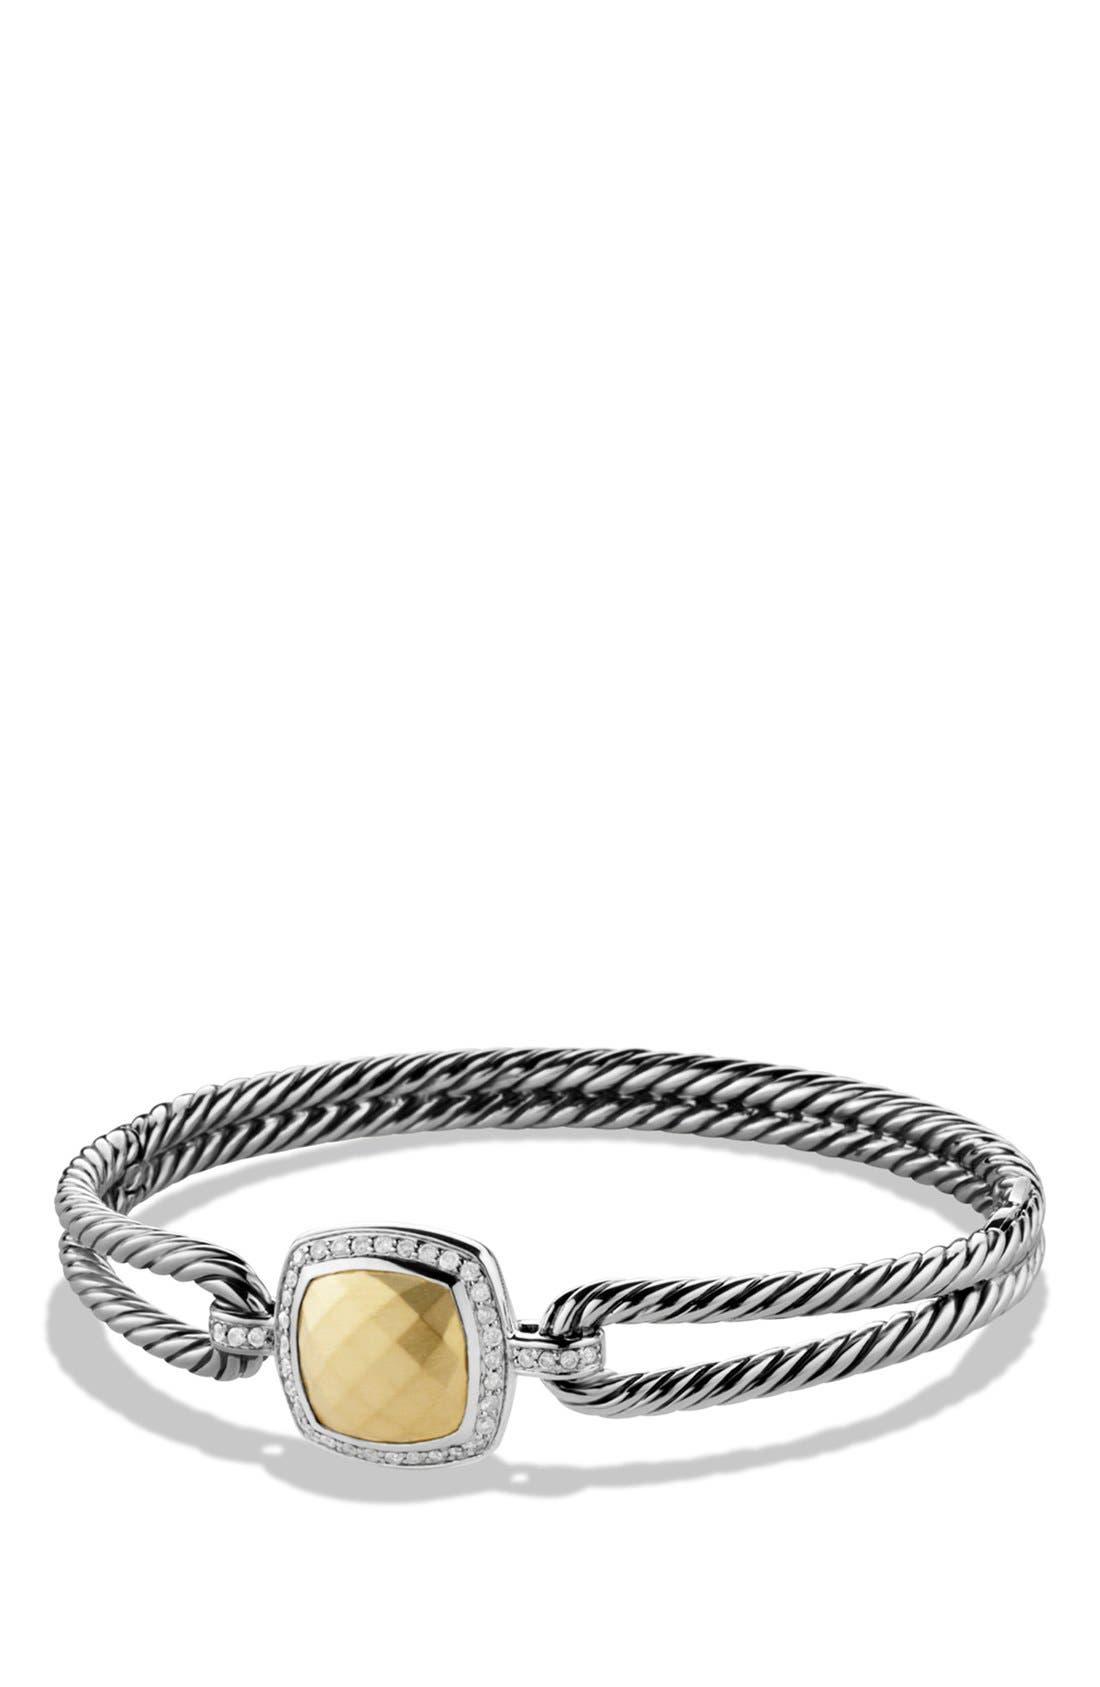 Alternate Image 1 Selected - David Yurman 'Albion' Bracelet with Diamonds and Gold